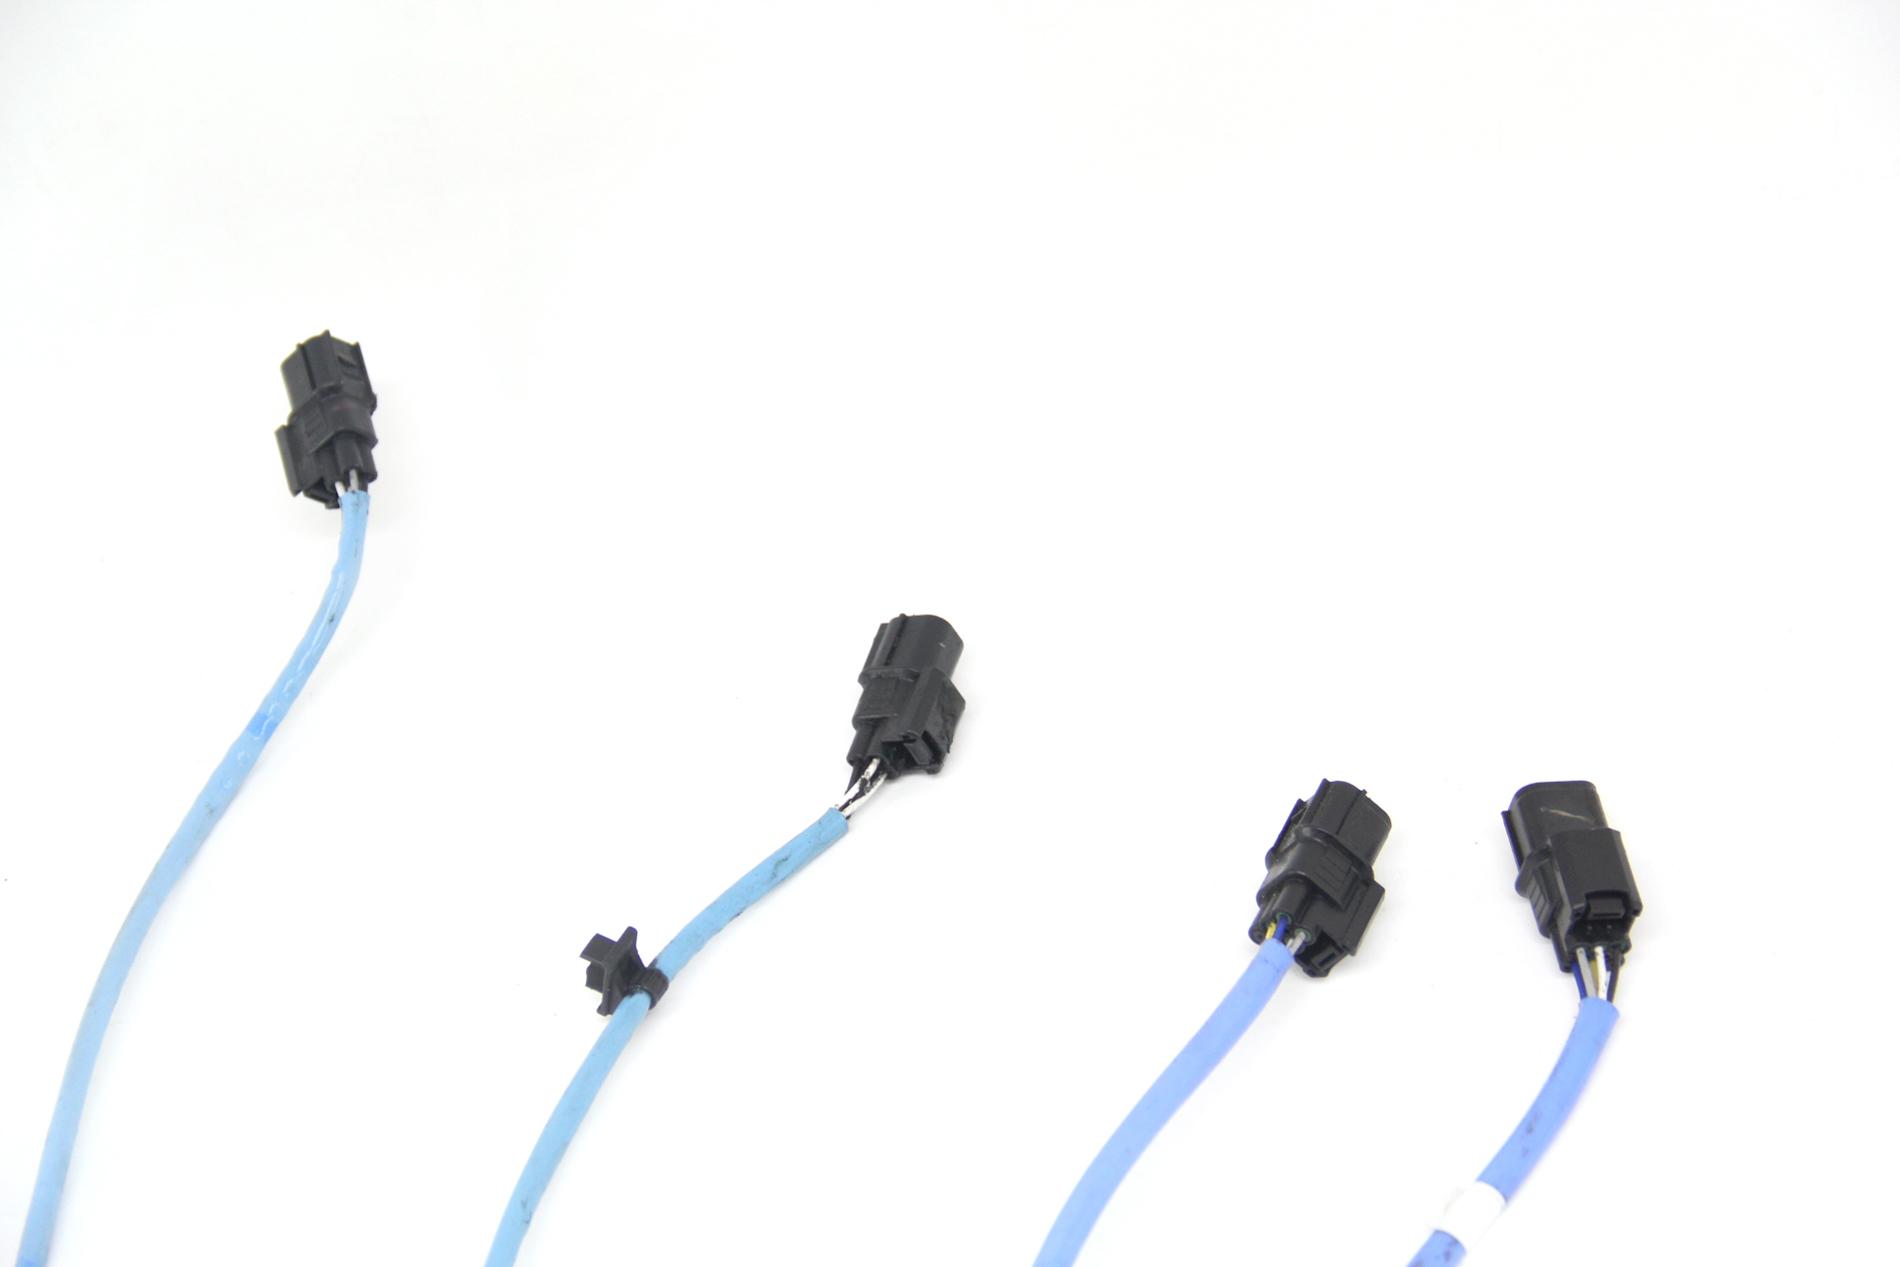 Acura Mdx Oxygen Sensor O2 Set Of 4 Pieces Oem 07 08 09